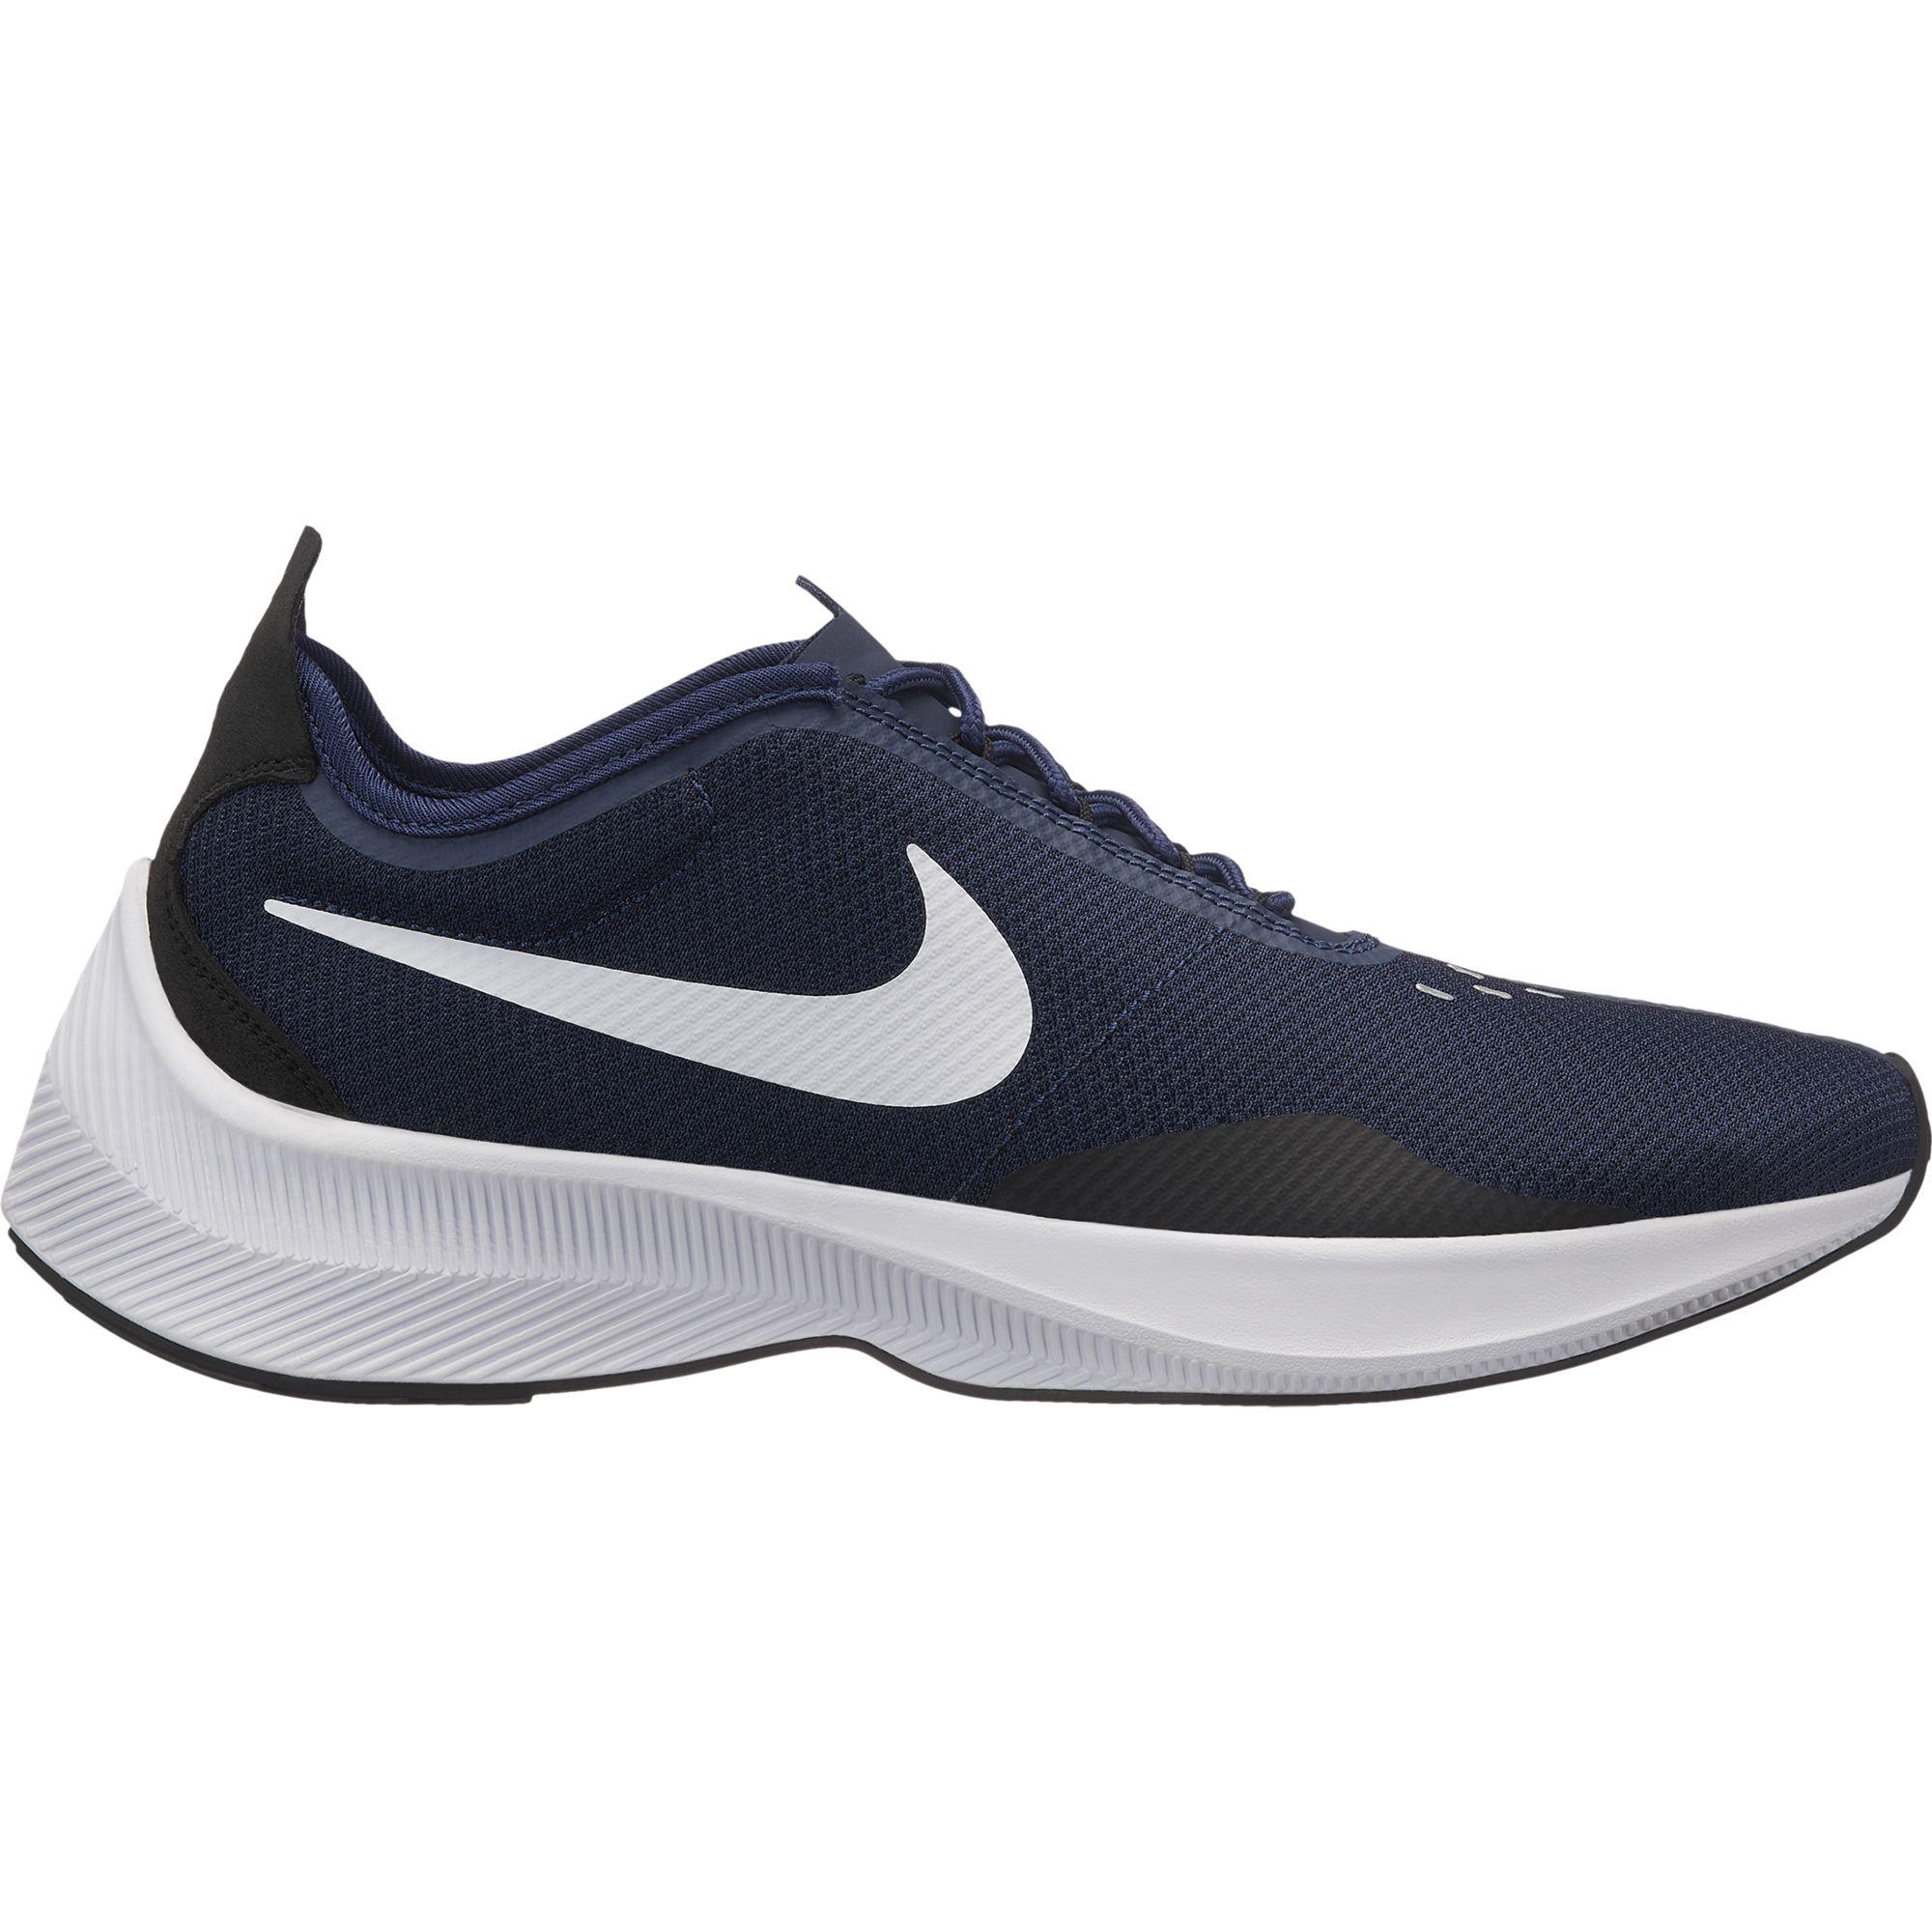 [ALPHA] NIKE EXP-Z07 AO1544-401 男鞋 運動休閒鞋